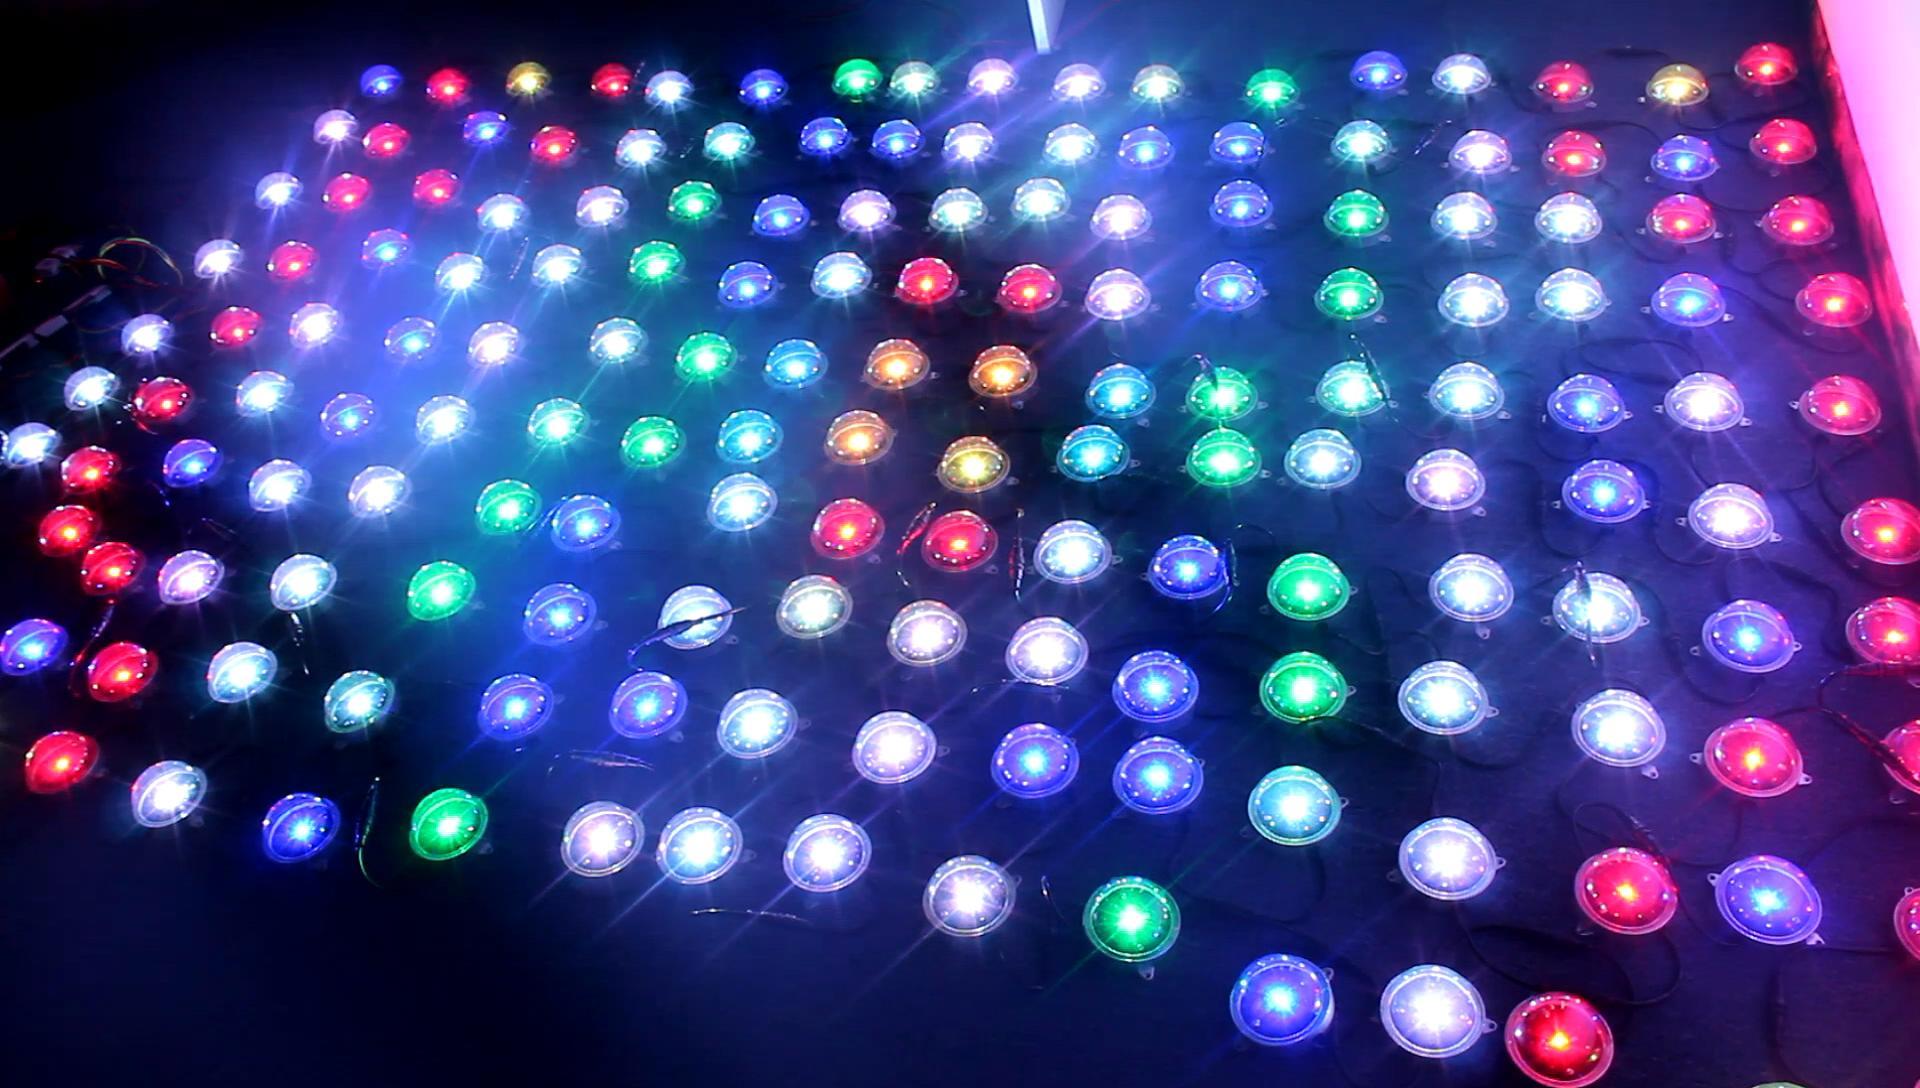 Dmx Led Rgb Pixel Lighting Dv12 24v High Dot Light Matrix Nightclub Lights